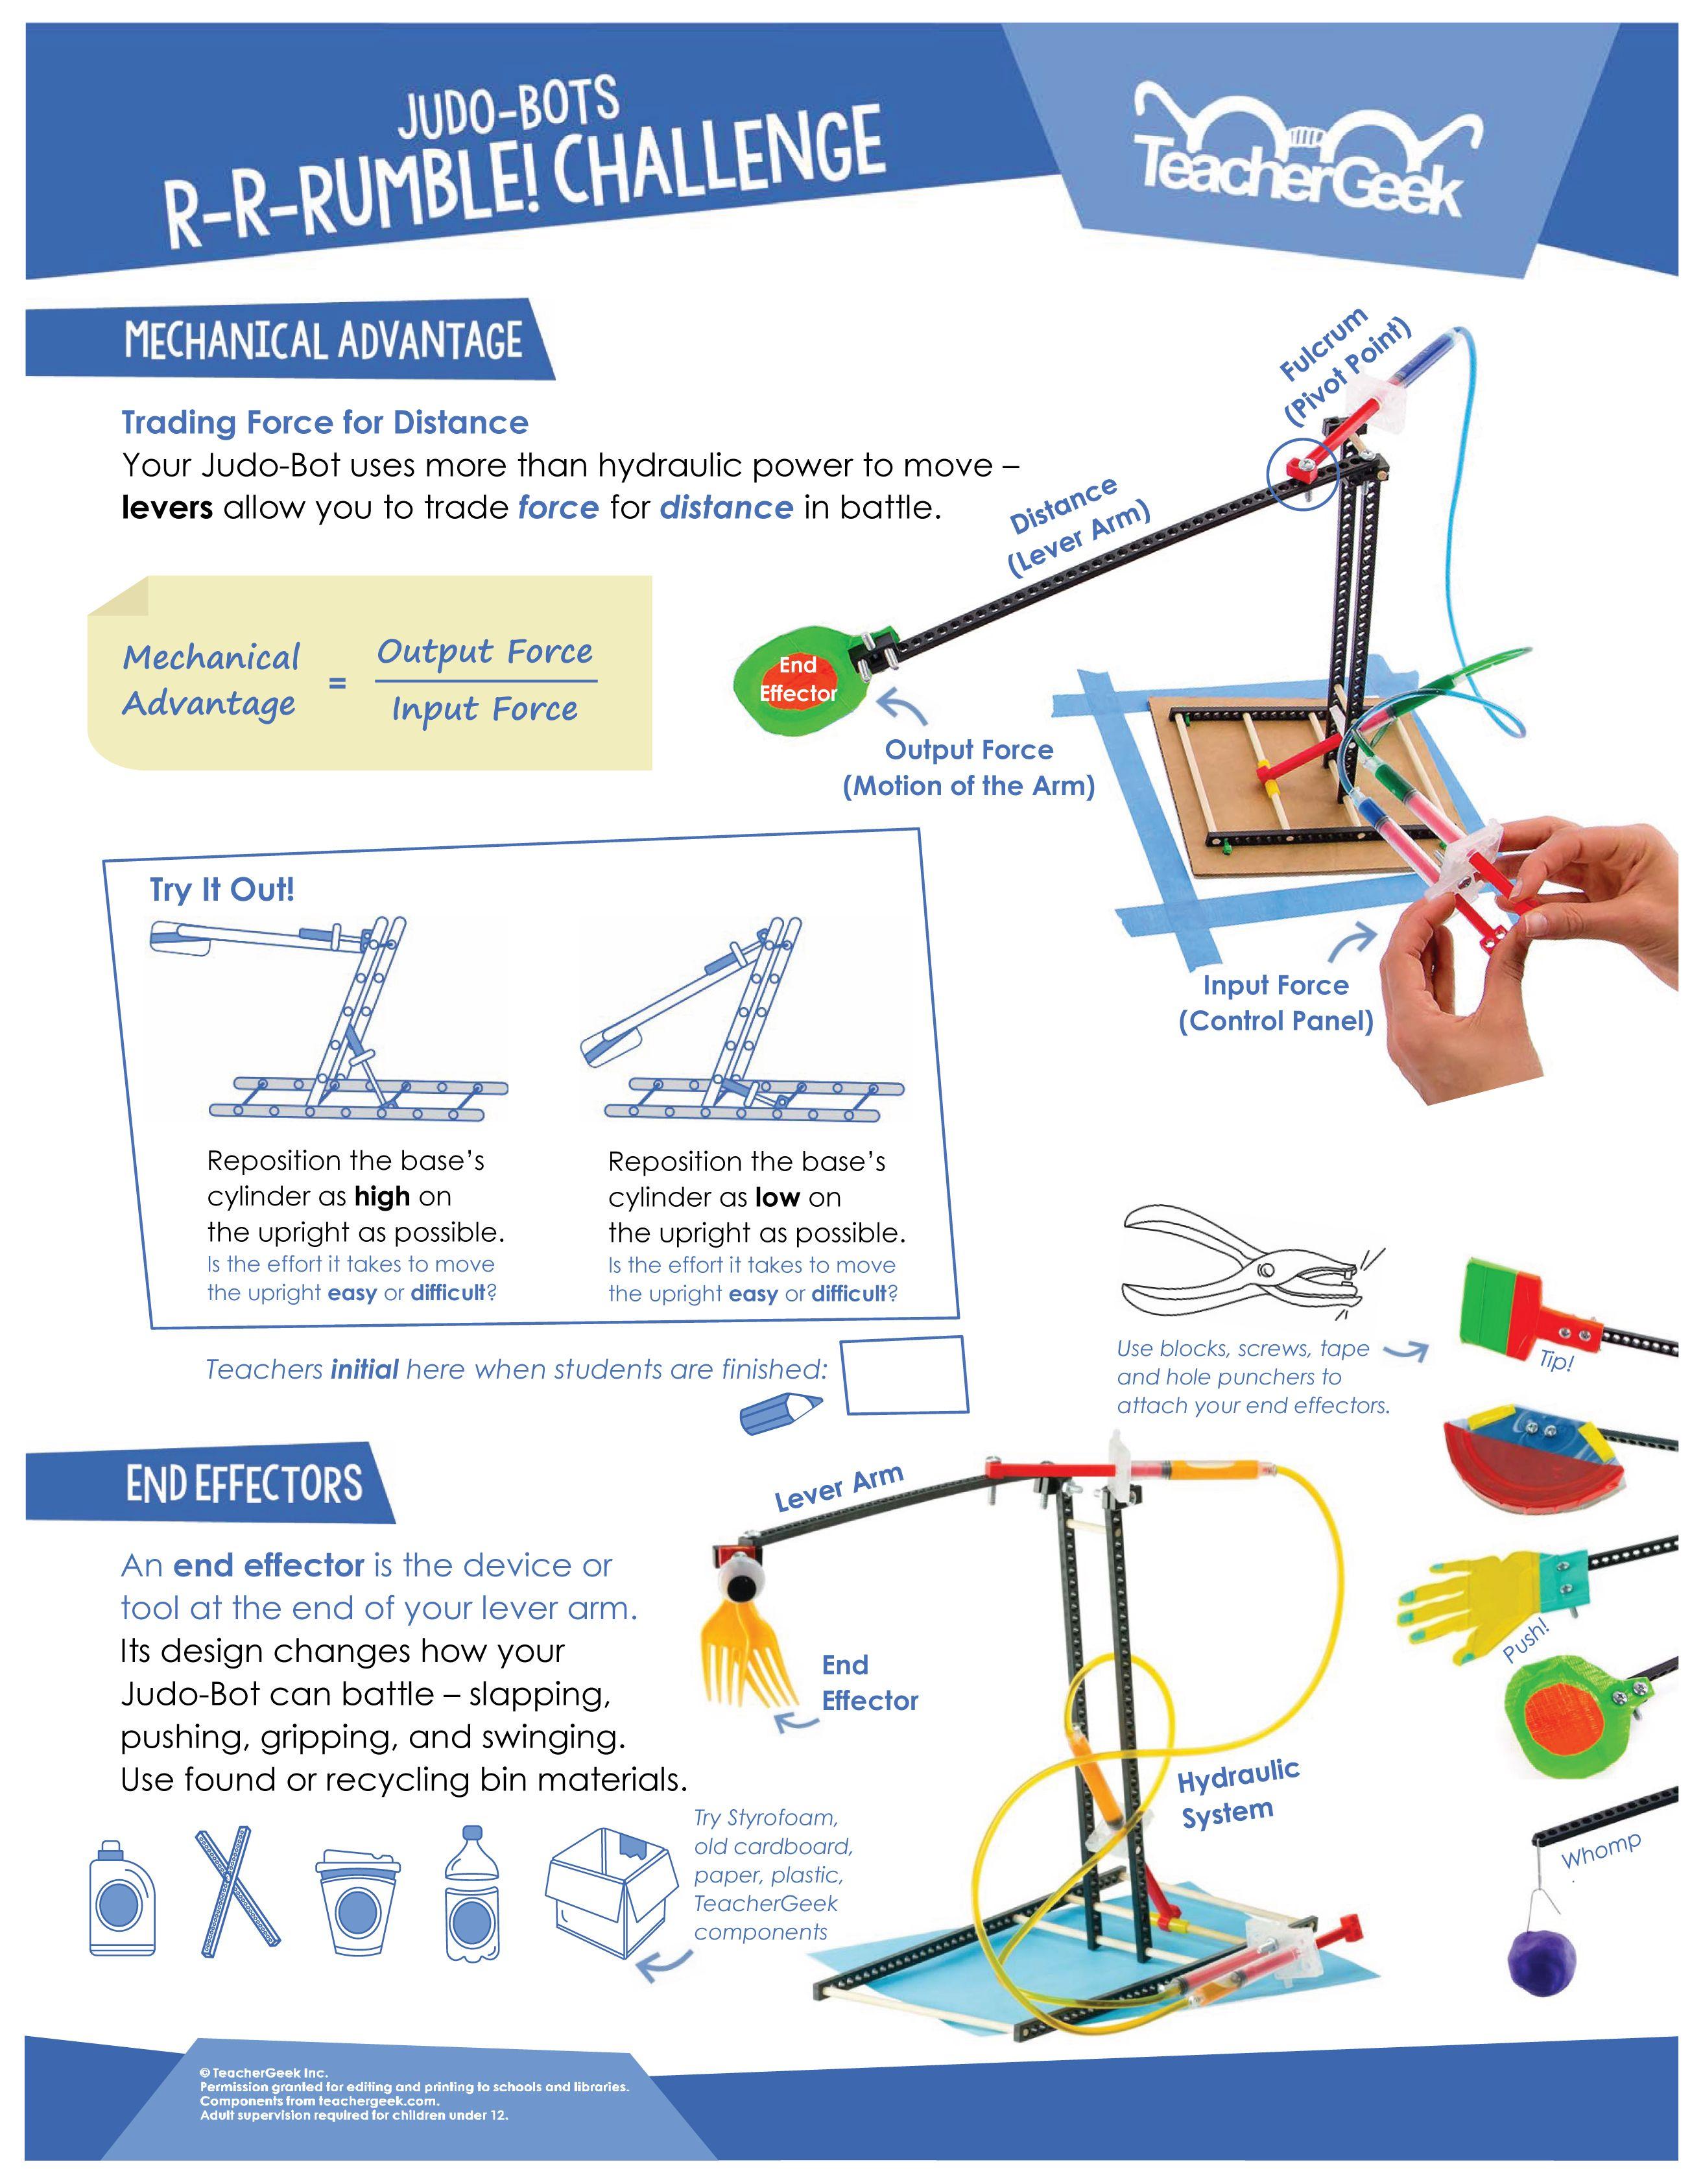 Judo Bot Activity Documents Teachergeek Physics Projects Science Fair Engineering Design Process